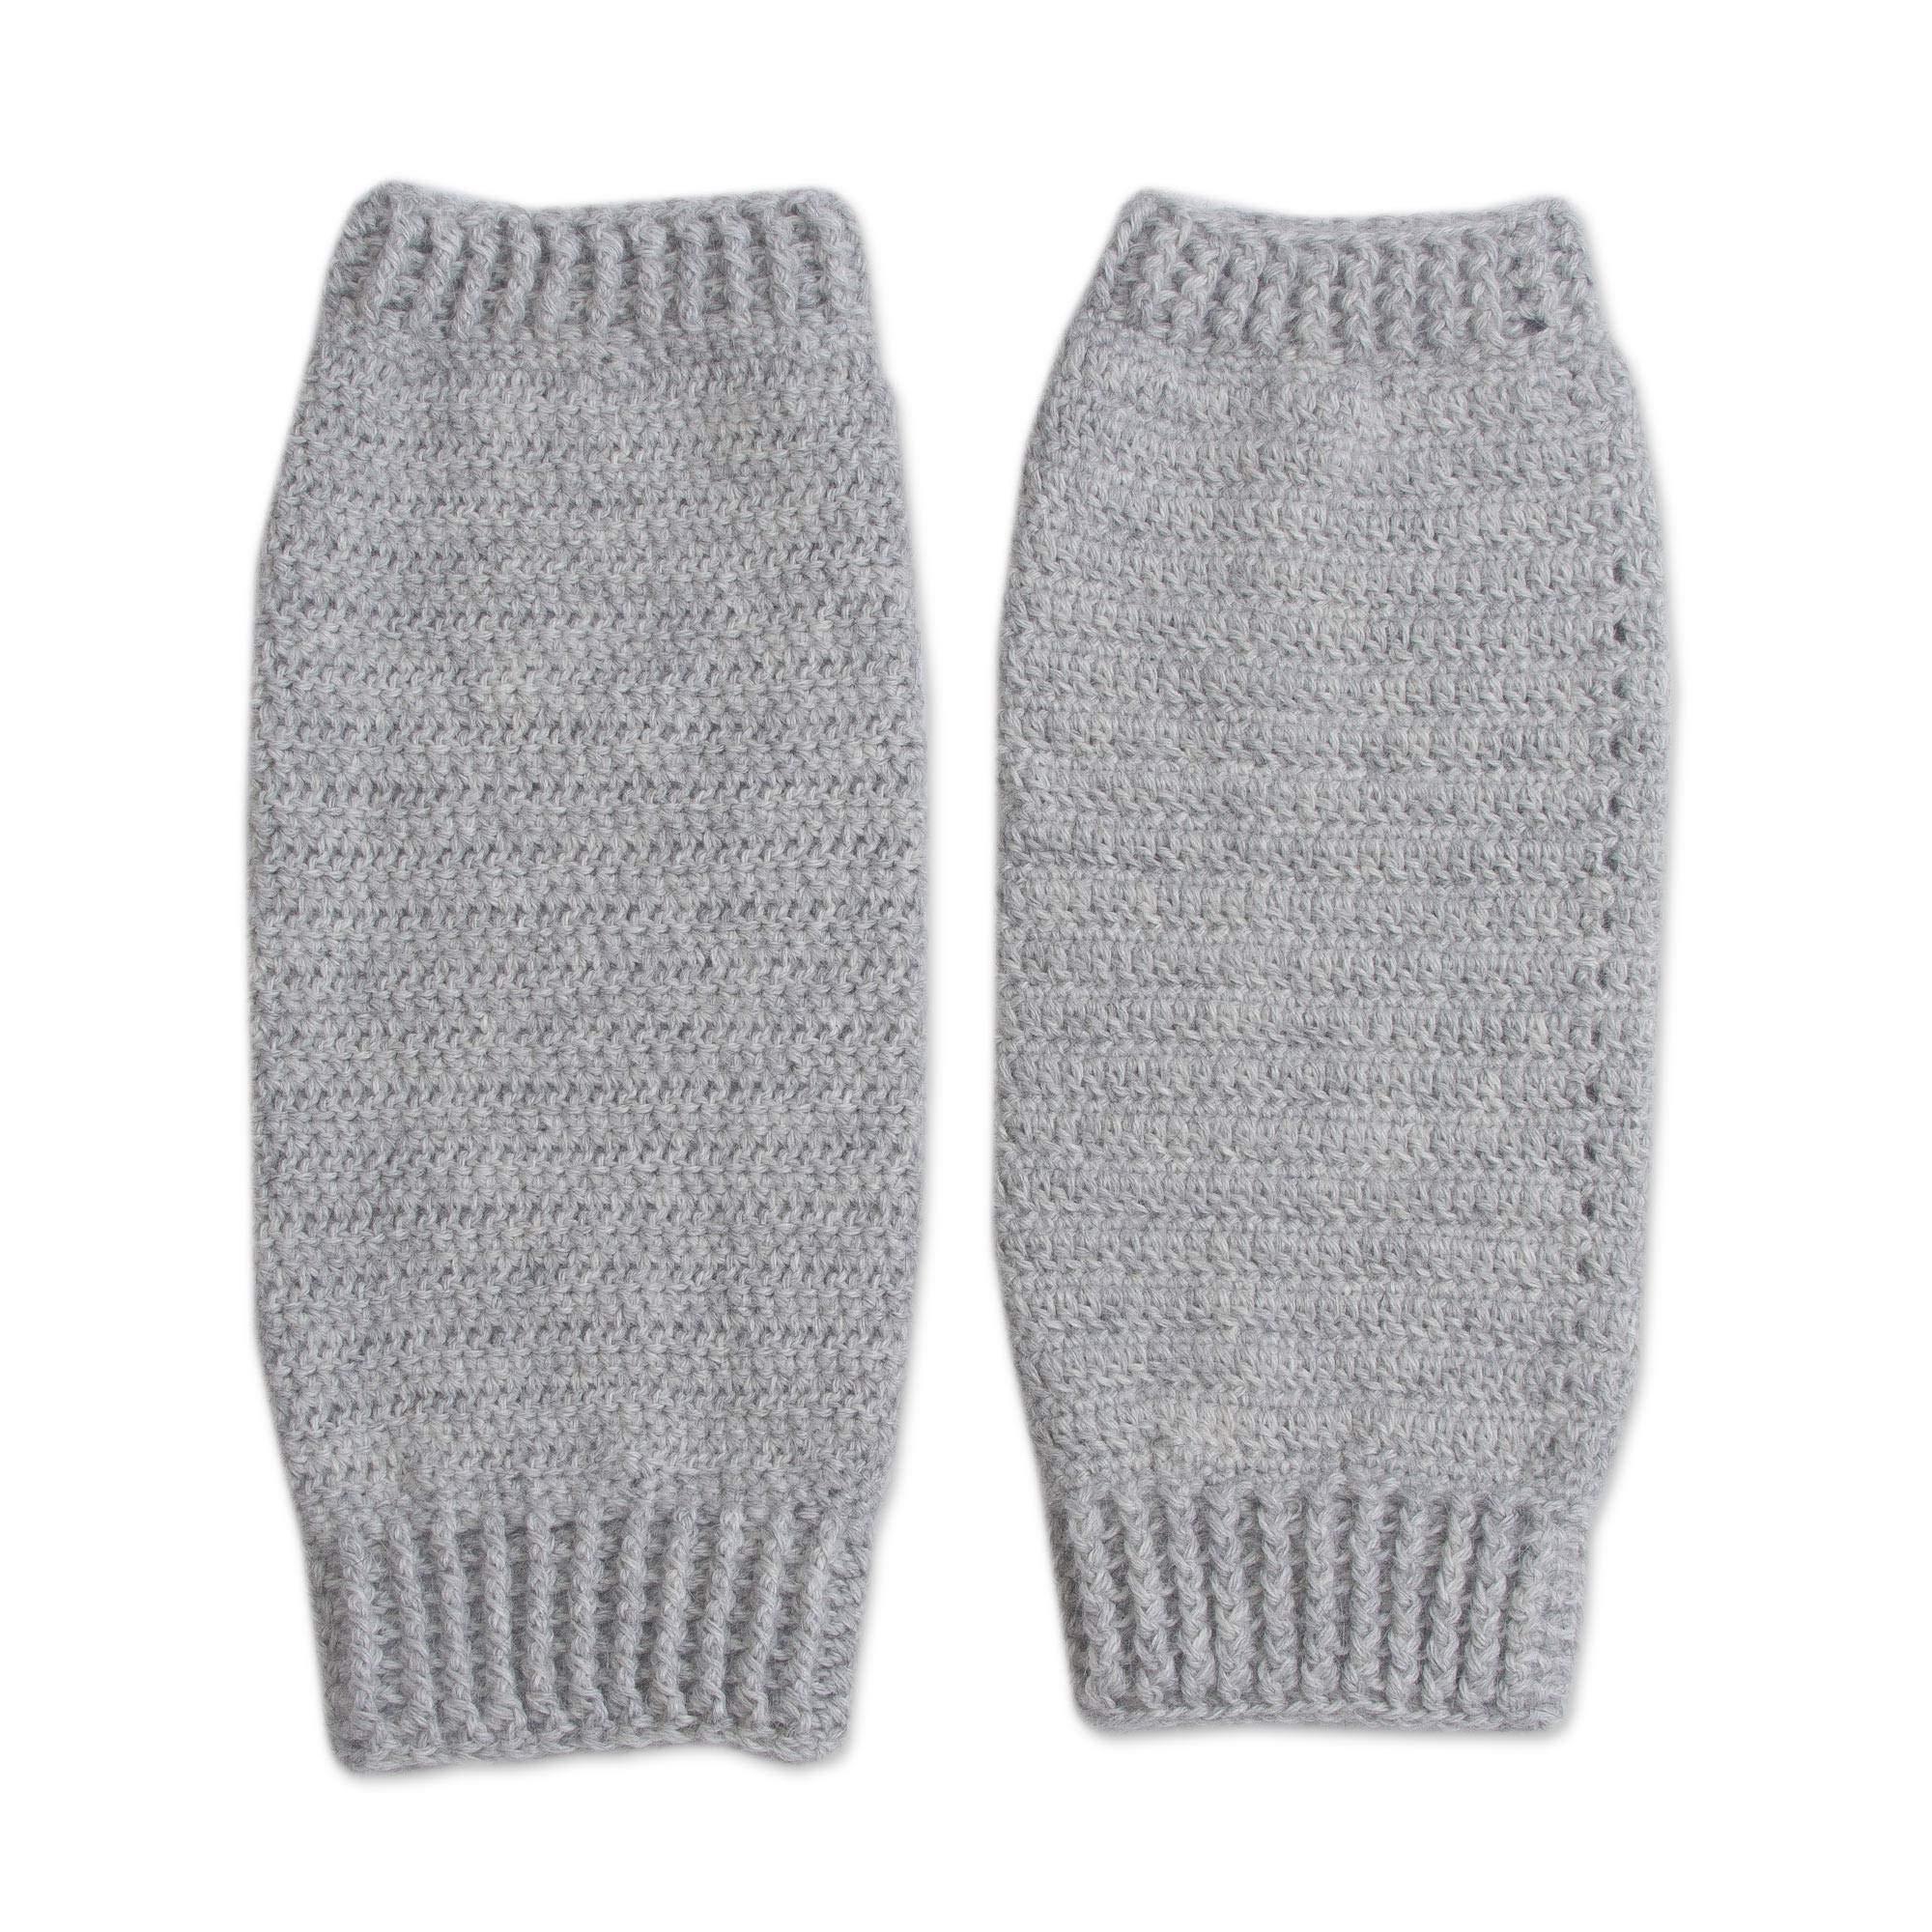 NOVICA Gray Alpaca Blend Leg Warmers, Cozy Smoke Grey' by NOVICA